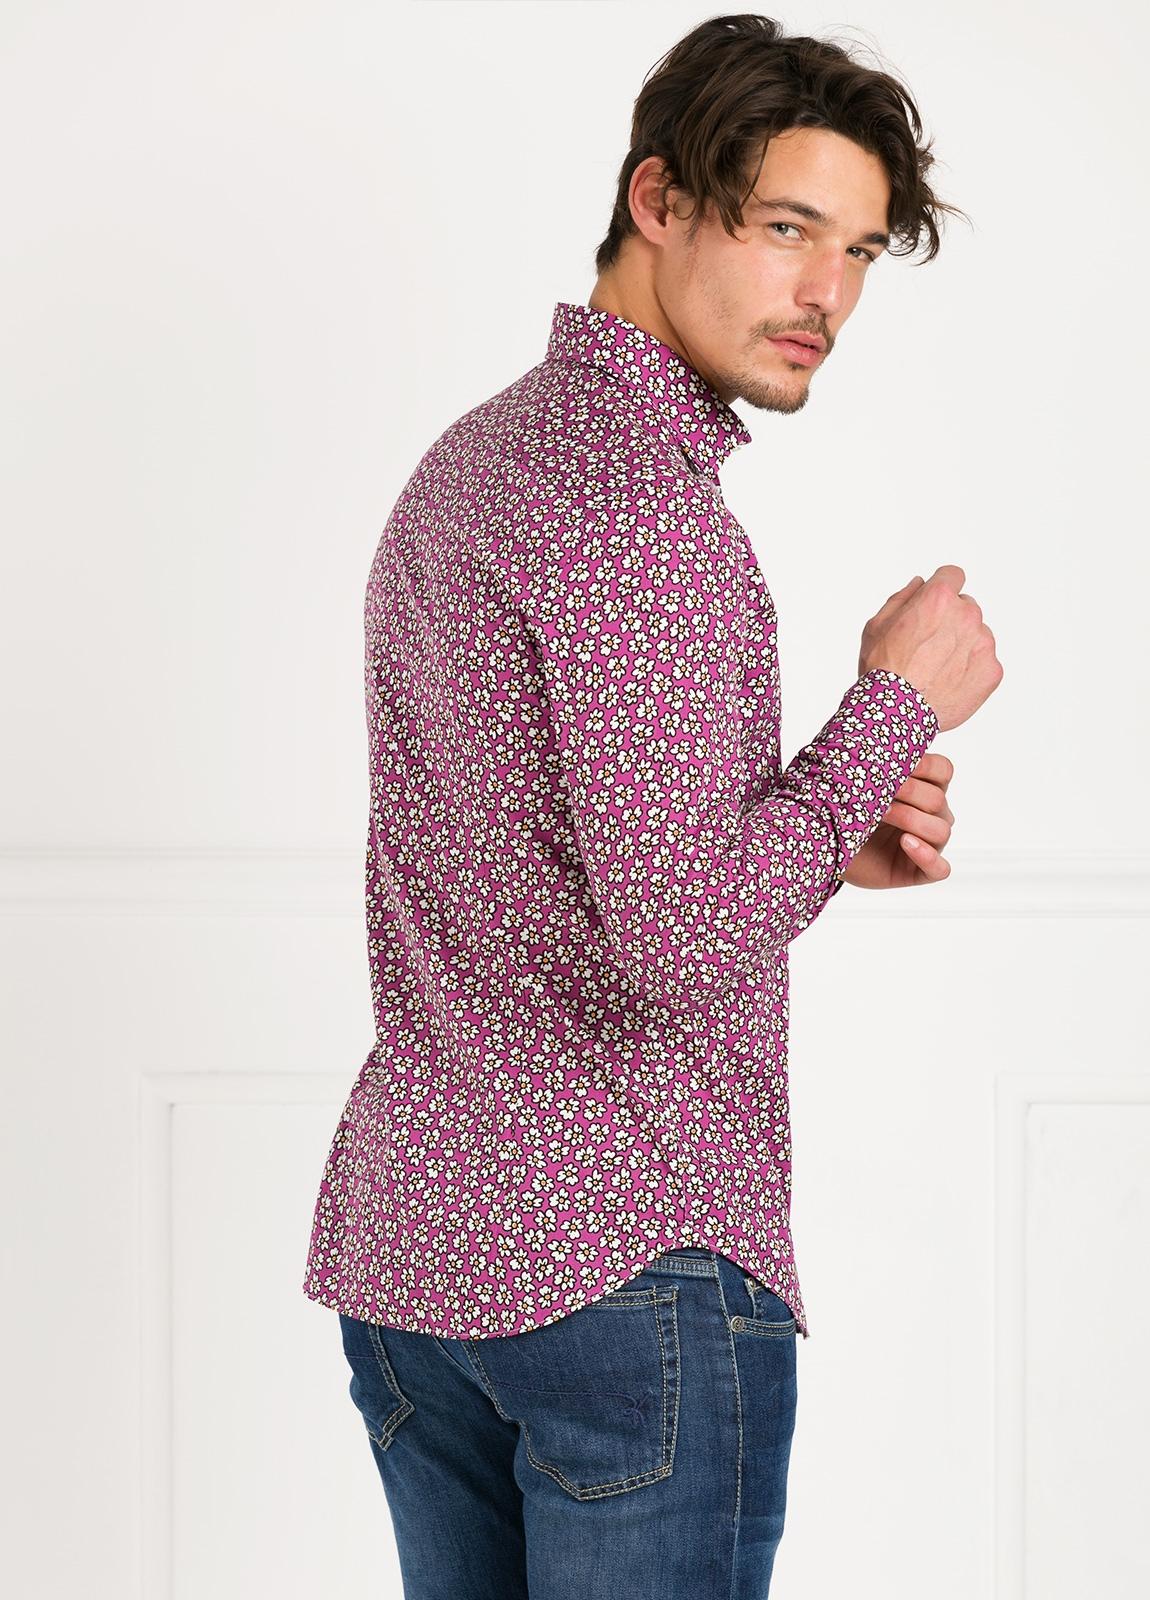 Camisa Leisure Wear SLIM FIT modelo PORTO dibujo floral, fondo fuxia. 100% Algodón. - Ítem3